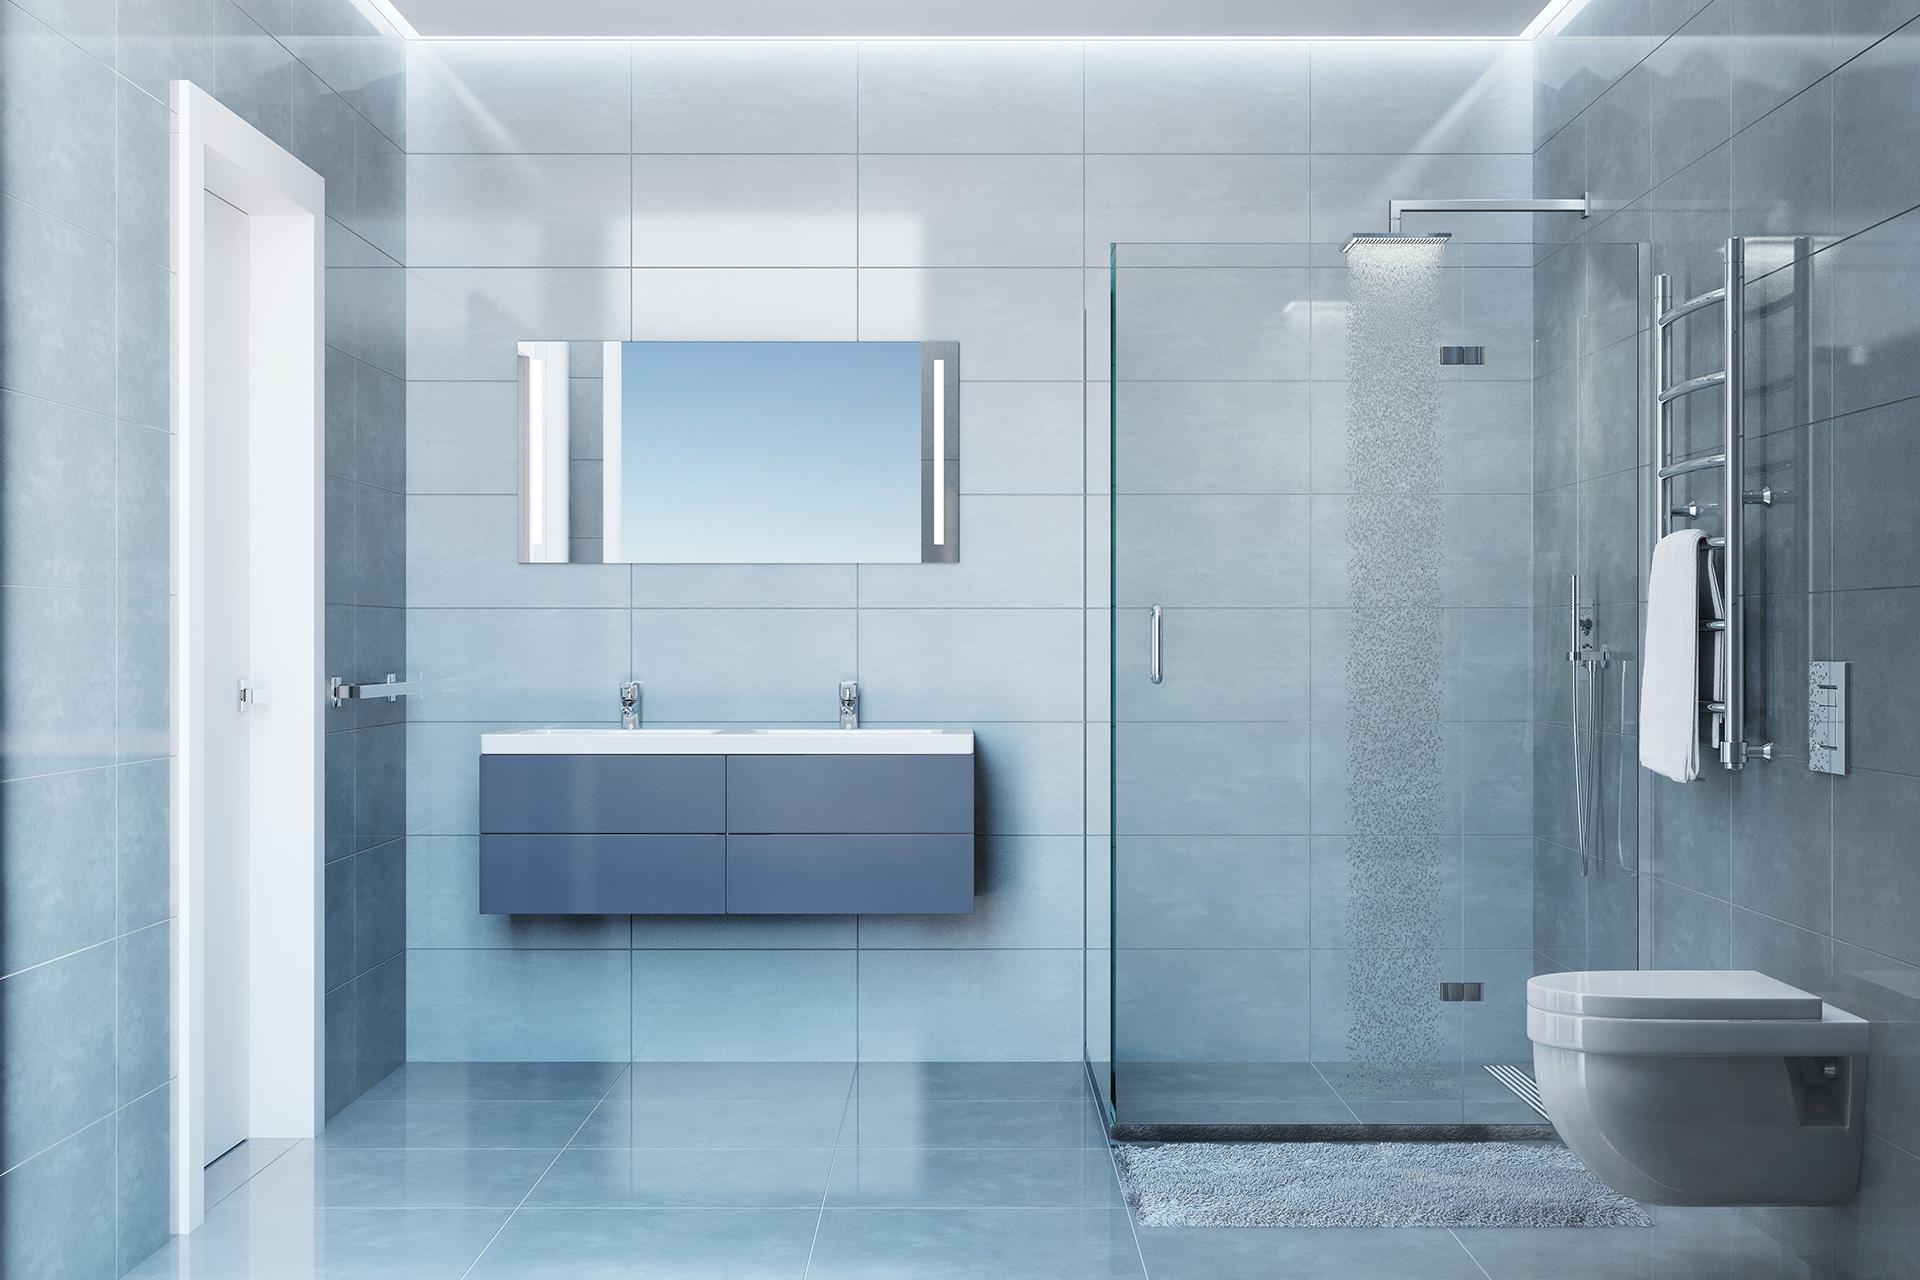 Rénovation salle de bains Bordeaux Gironde | Amplitude